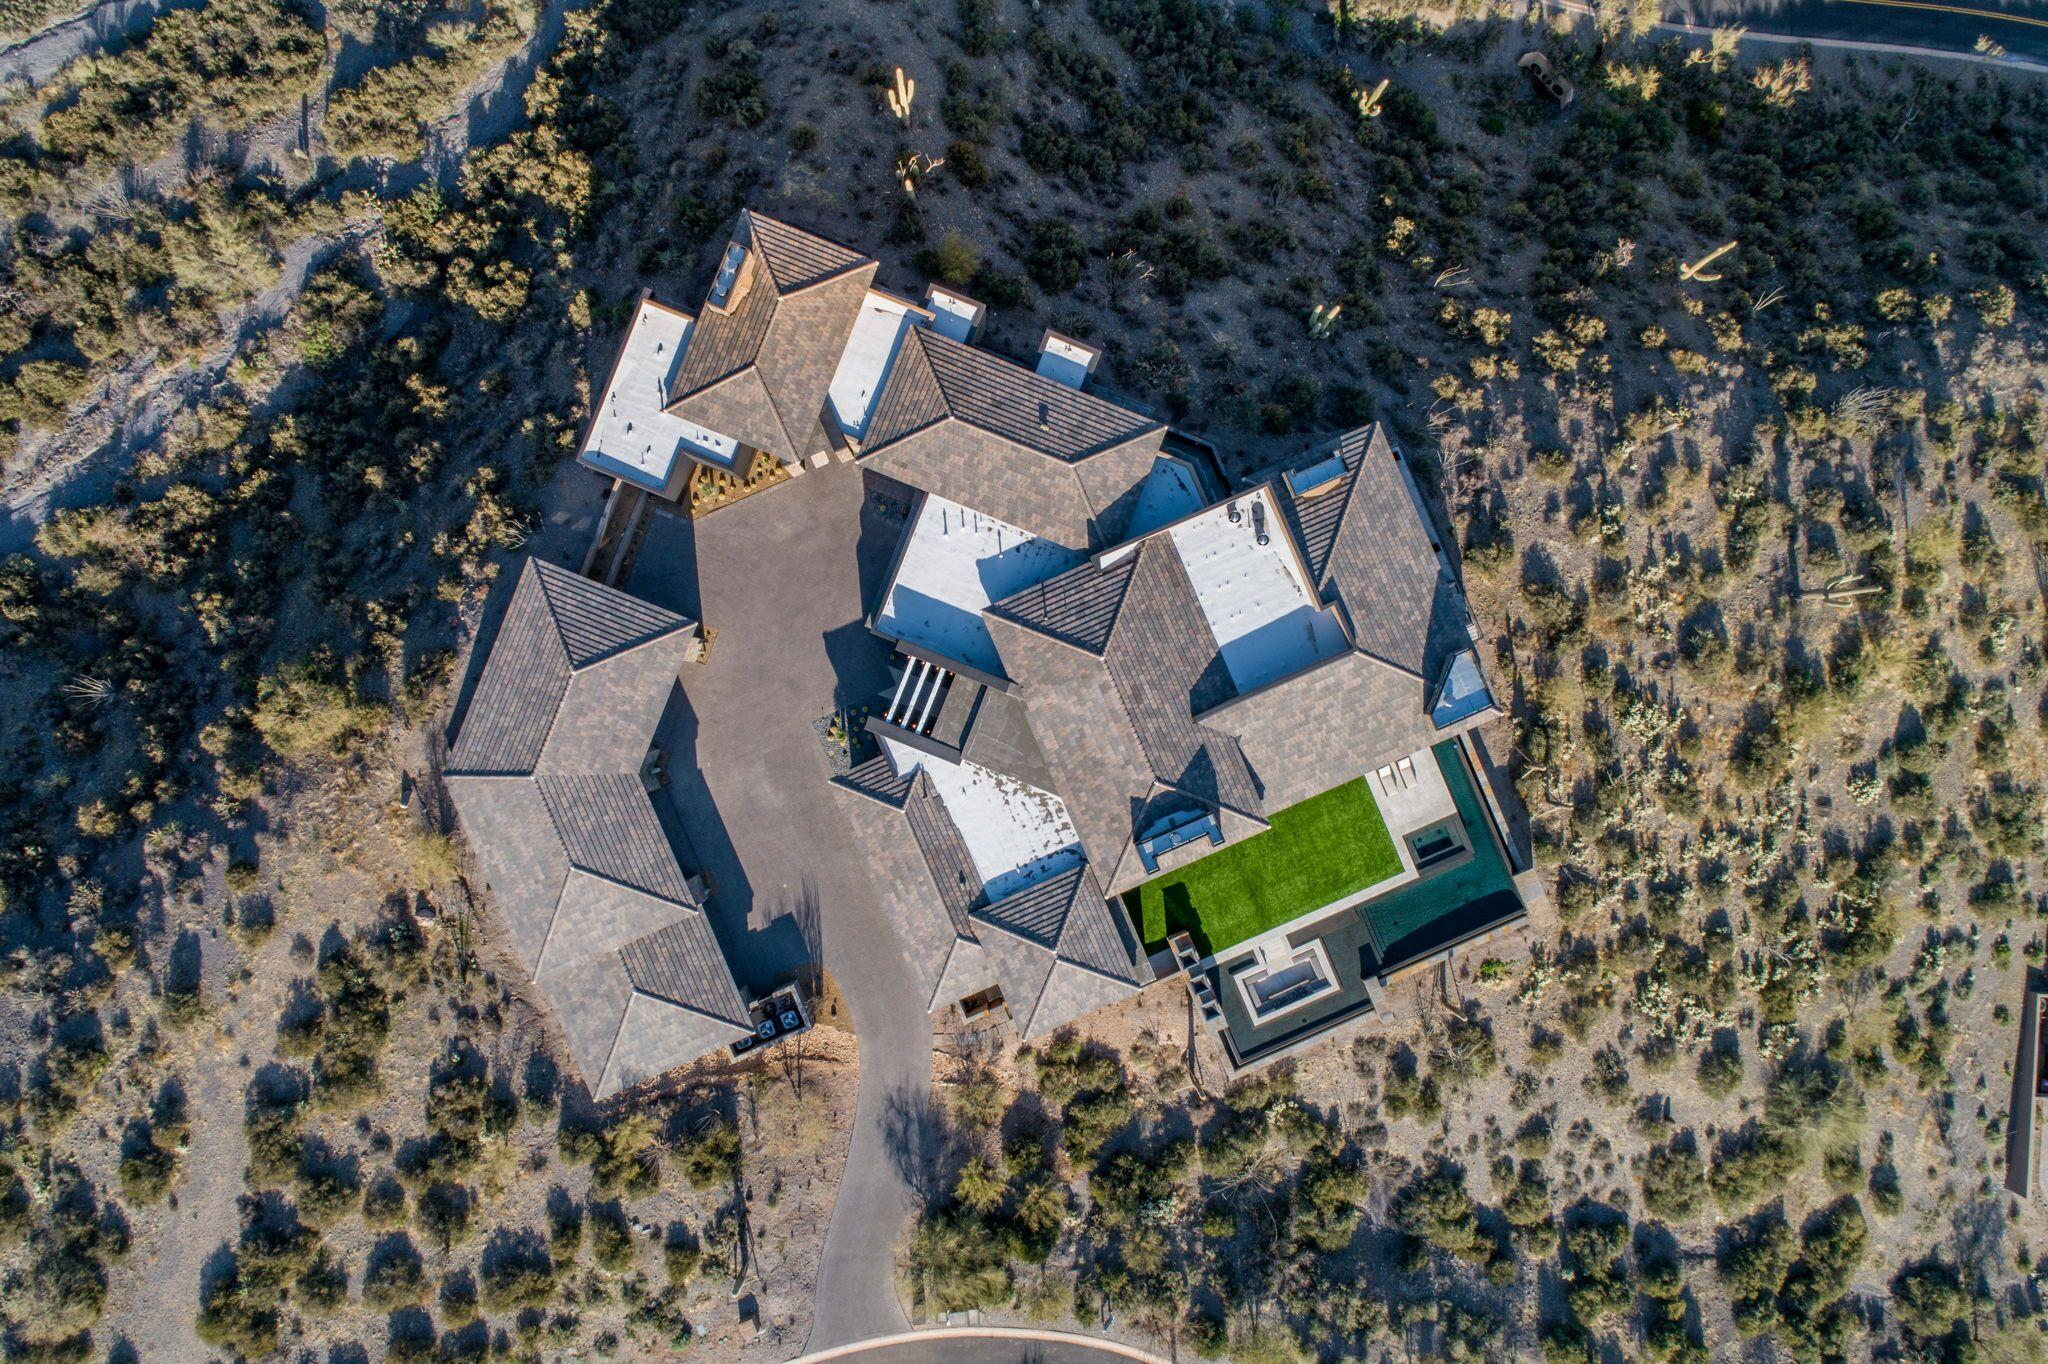 9300+E+Grapevine+Pass+Scottsdale-58-WebQuality-Birdseye+Views.jpg